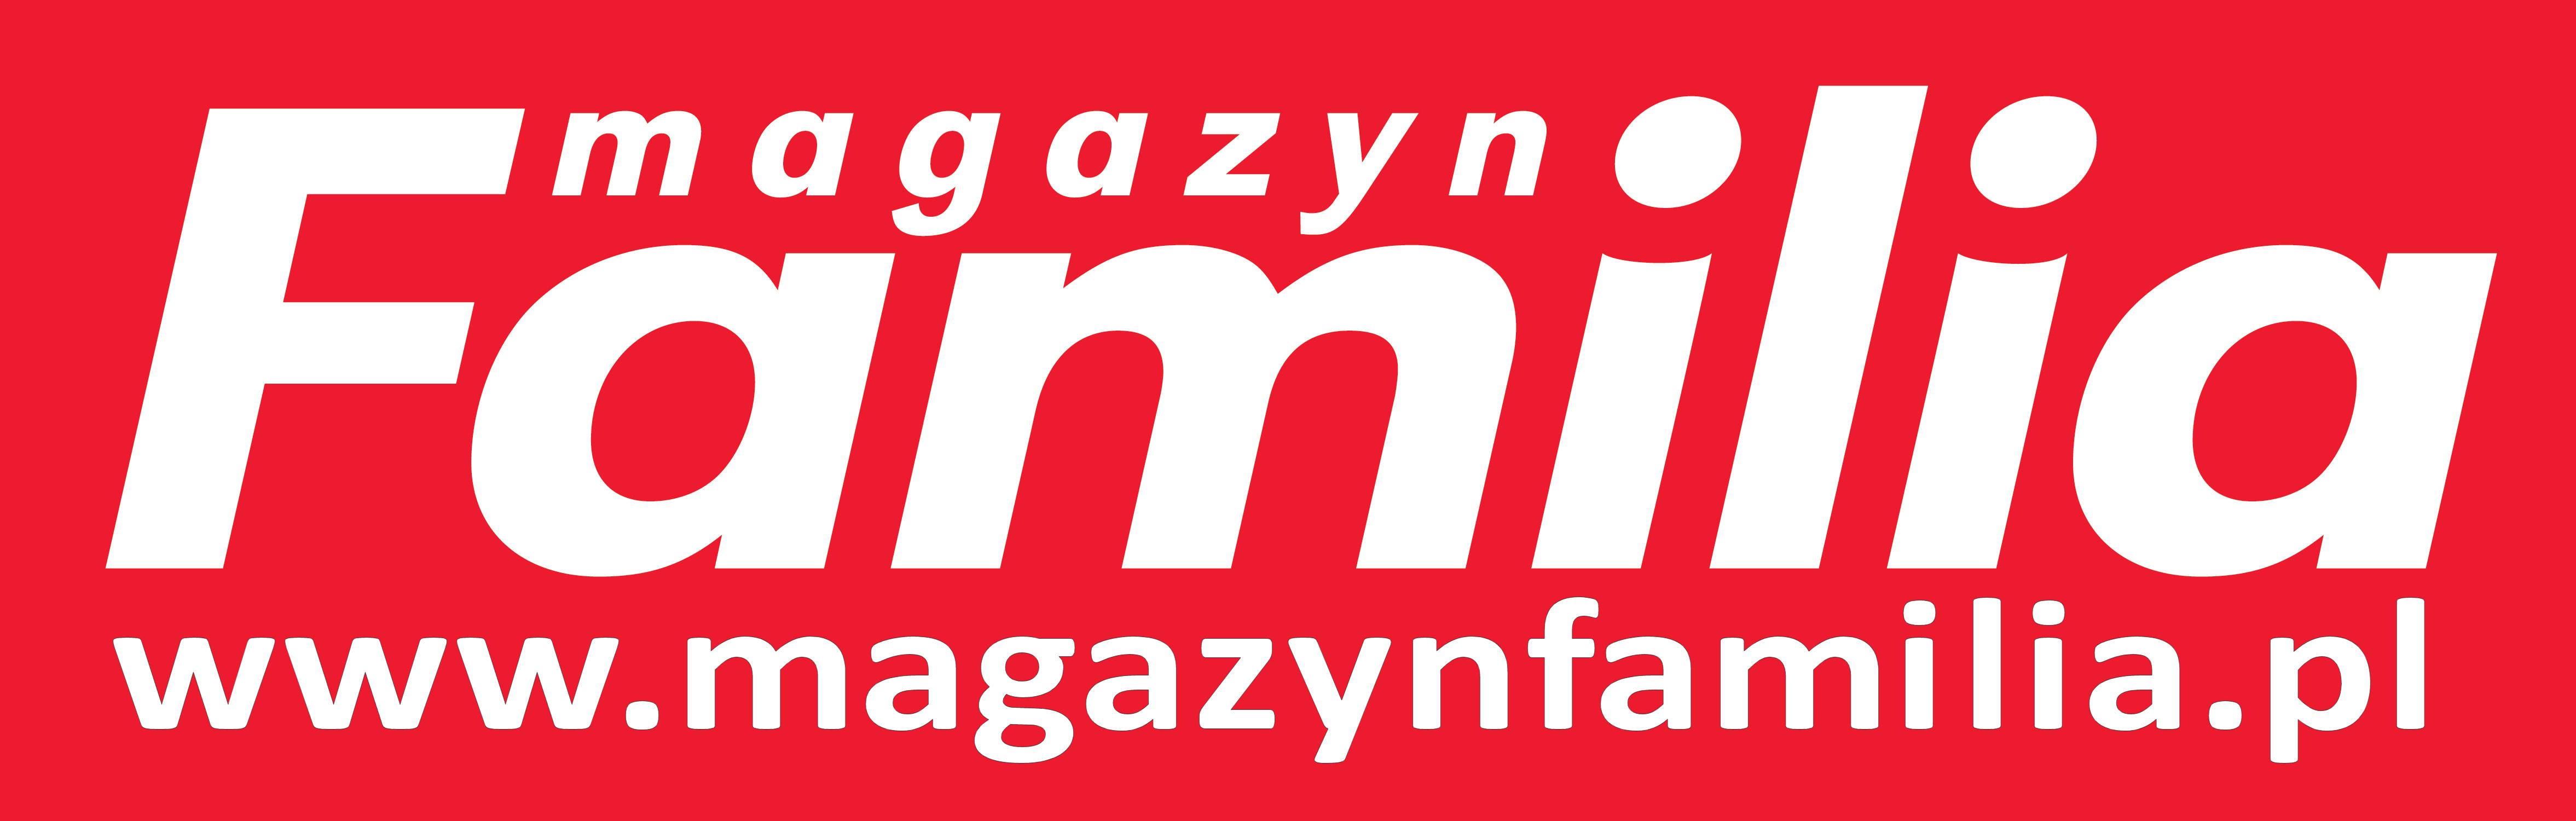 Magazyn Familia